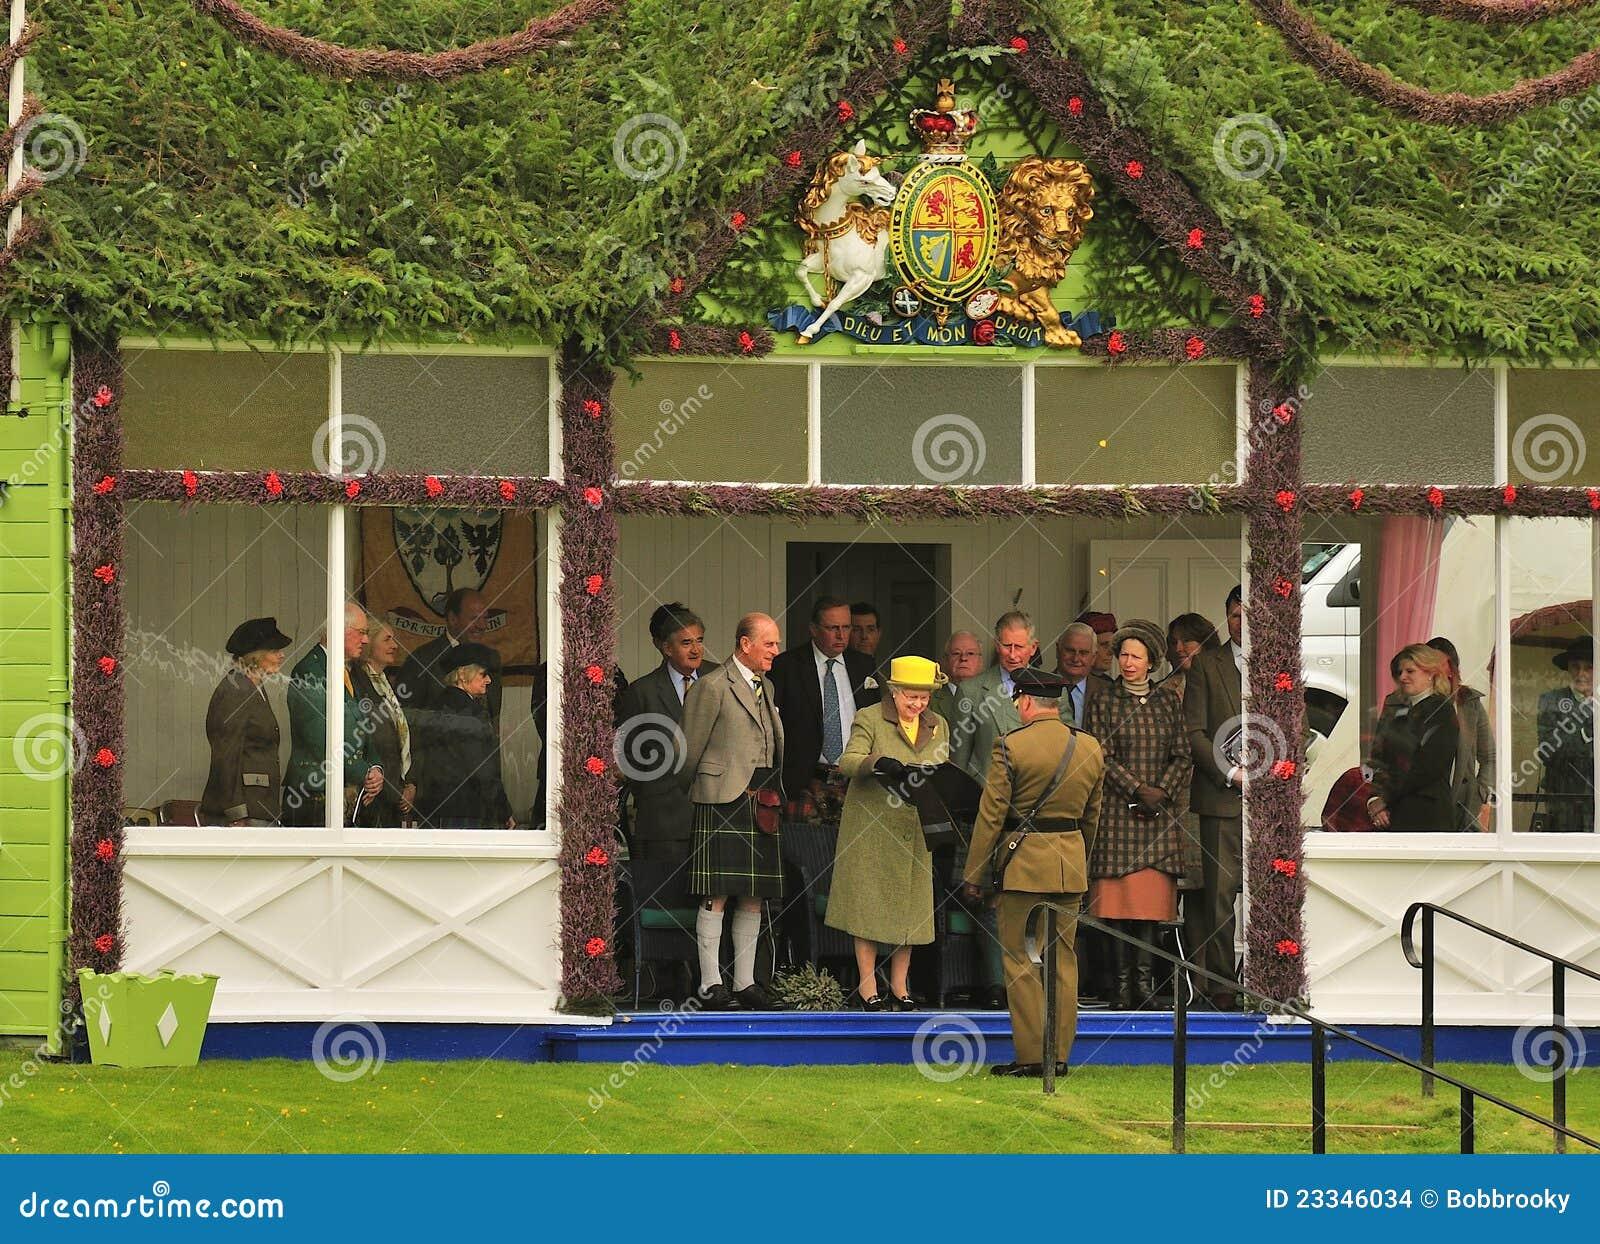 Royal family Presentation